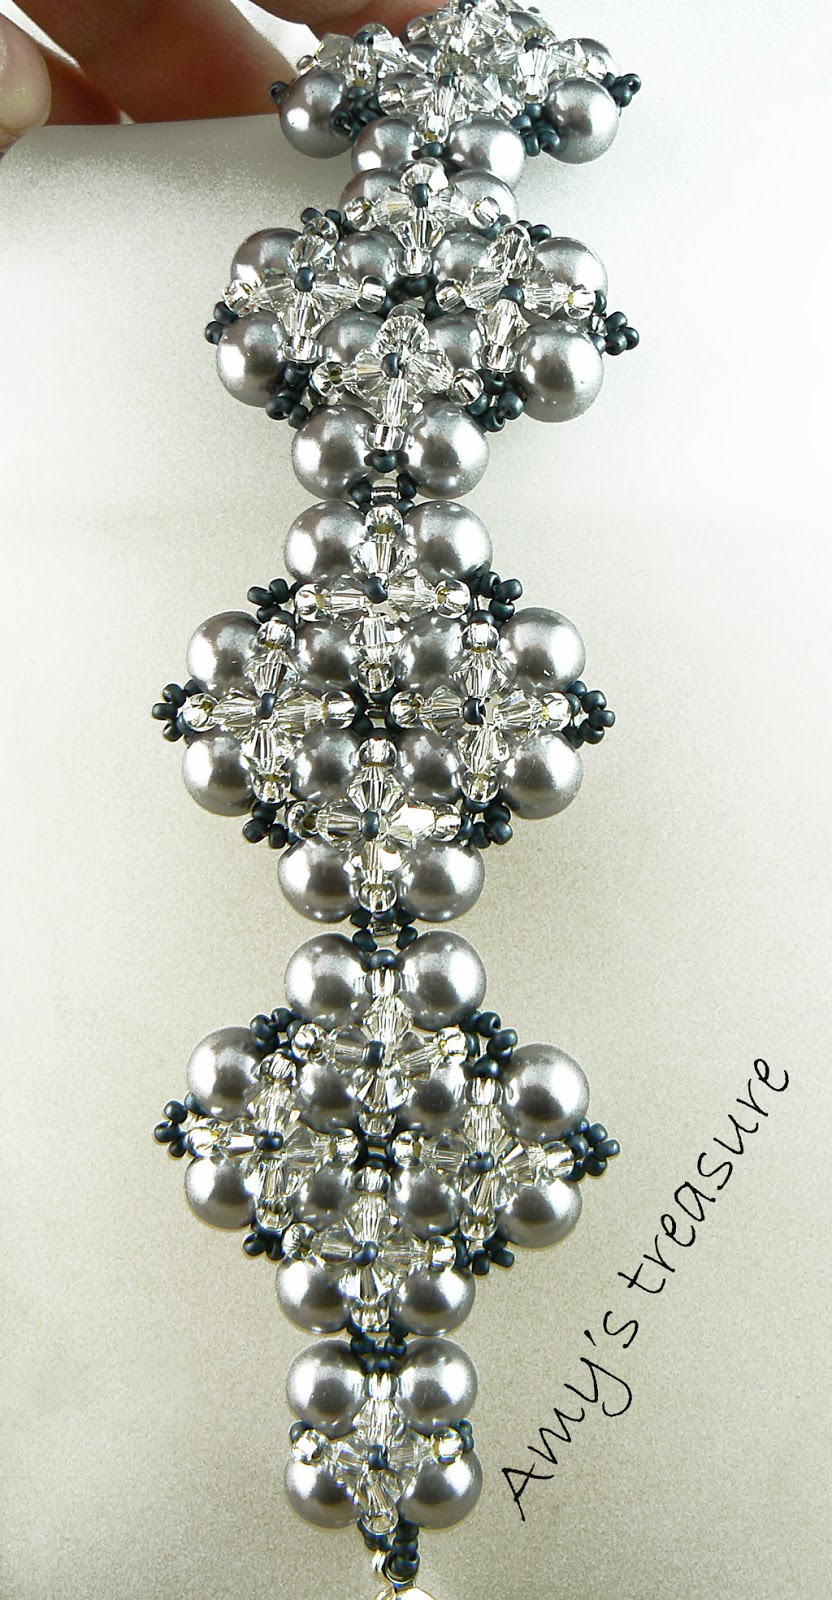 Amy's treasure: Winterglow bracelet